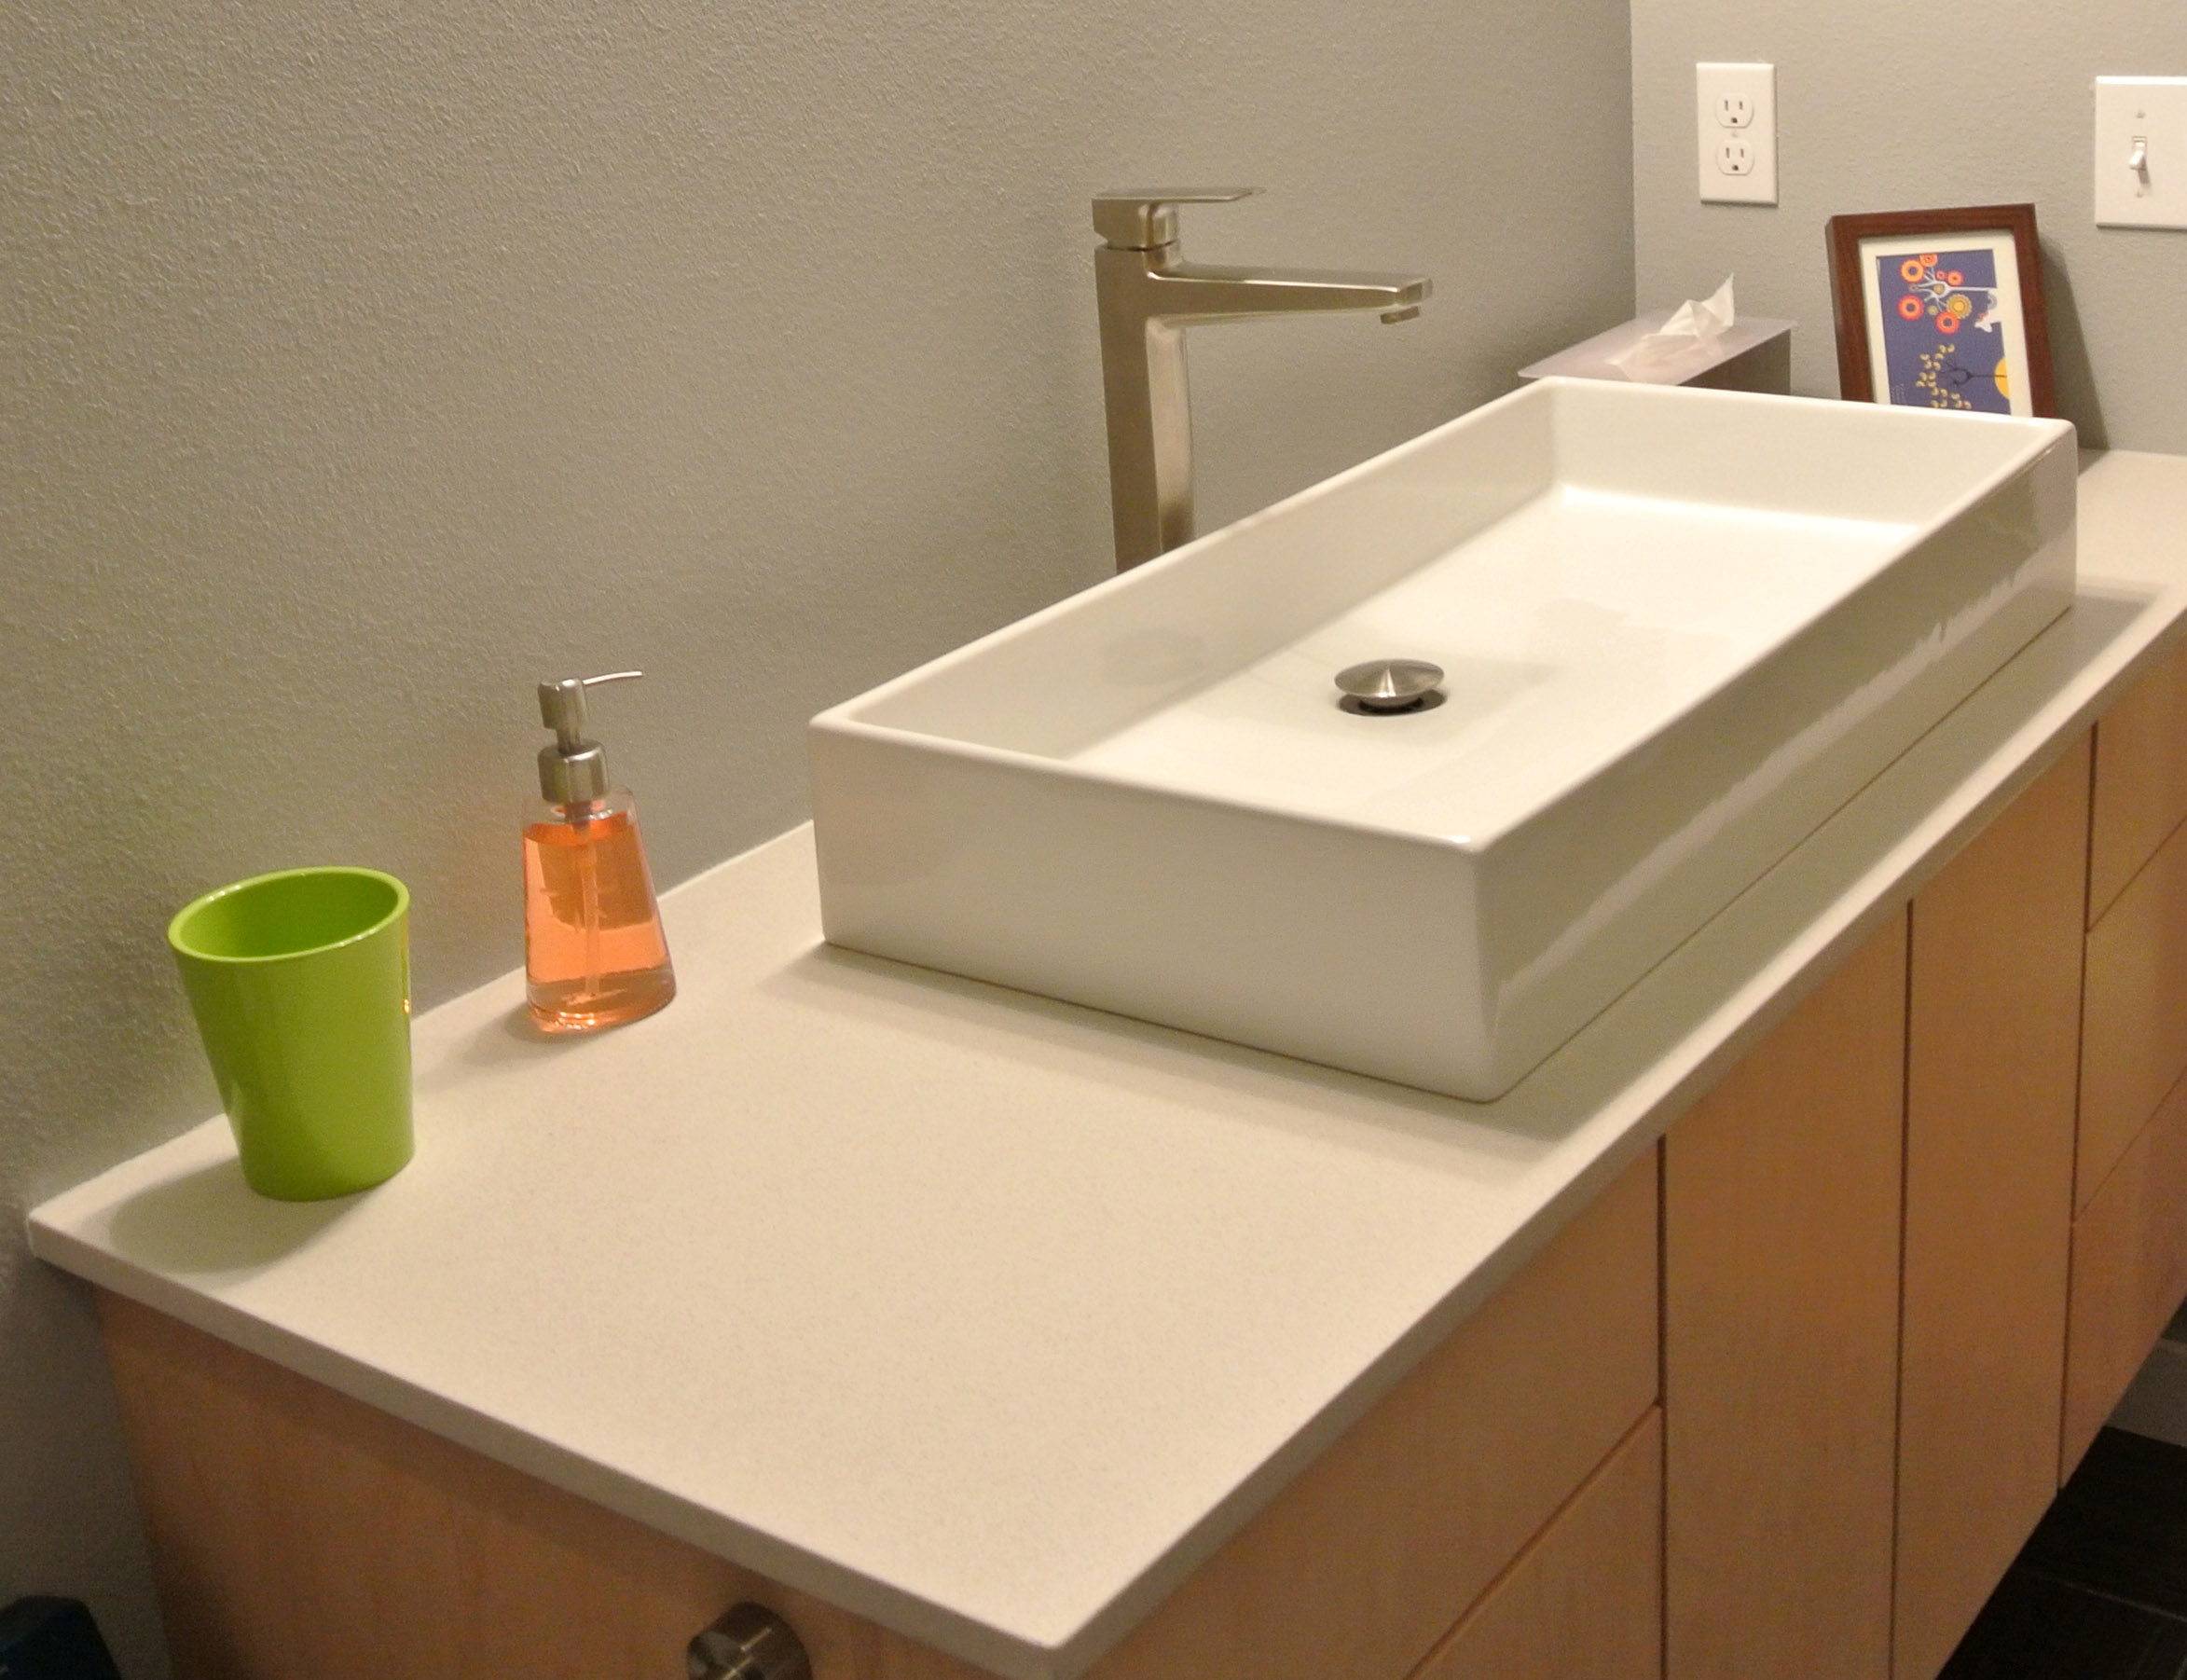 Sycamore - Bathroom Fixtures 2.JPG